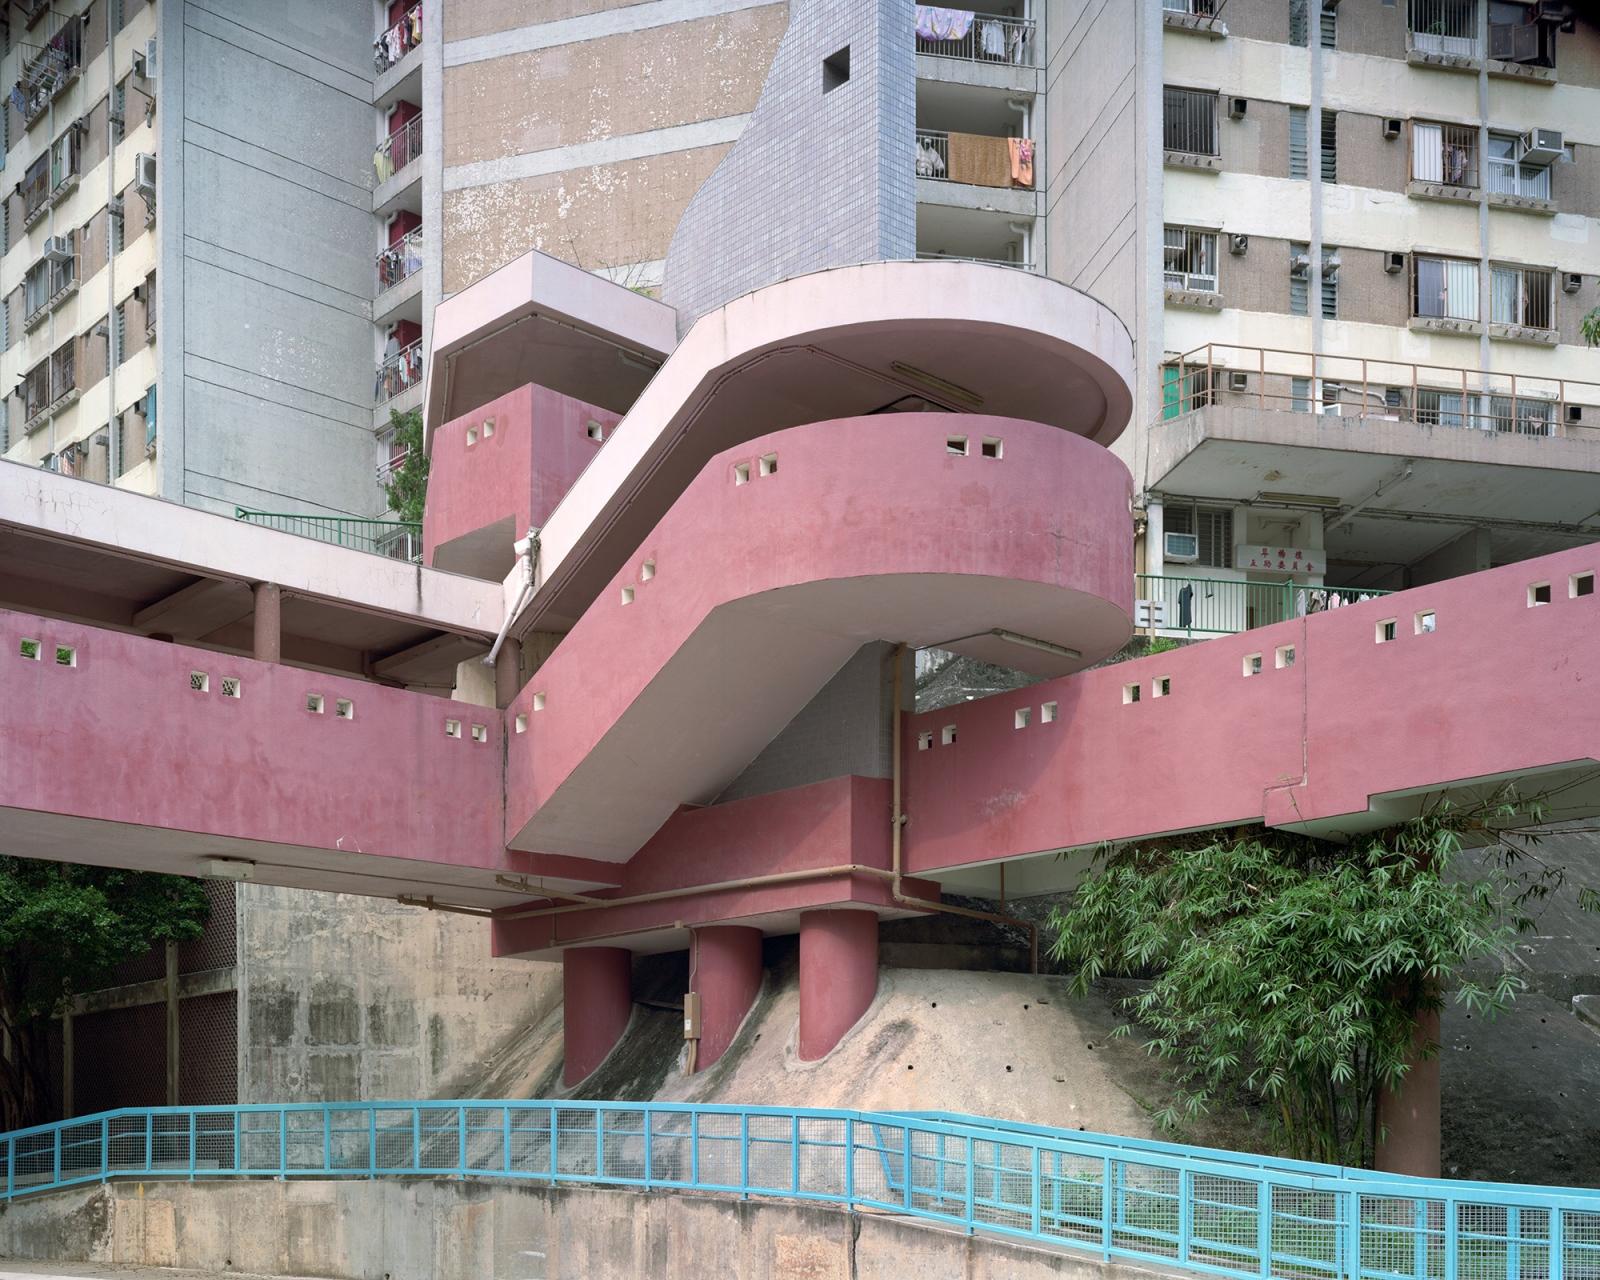 "Tsui Ping Estate, 7/2012 Archival Pigment Inkjet Print 28.8"" x 36"" / 40"" x 50"""